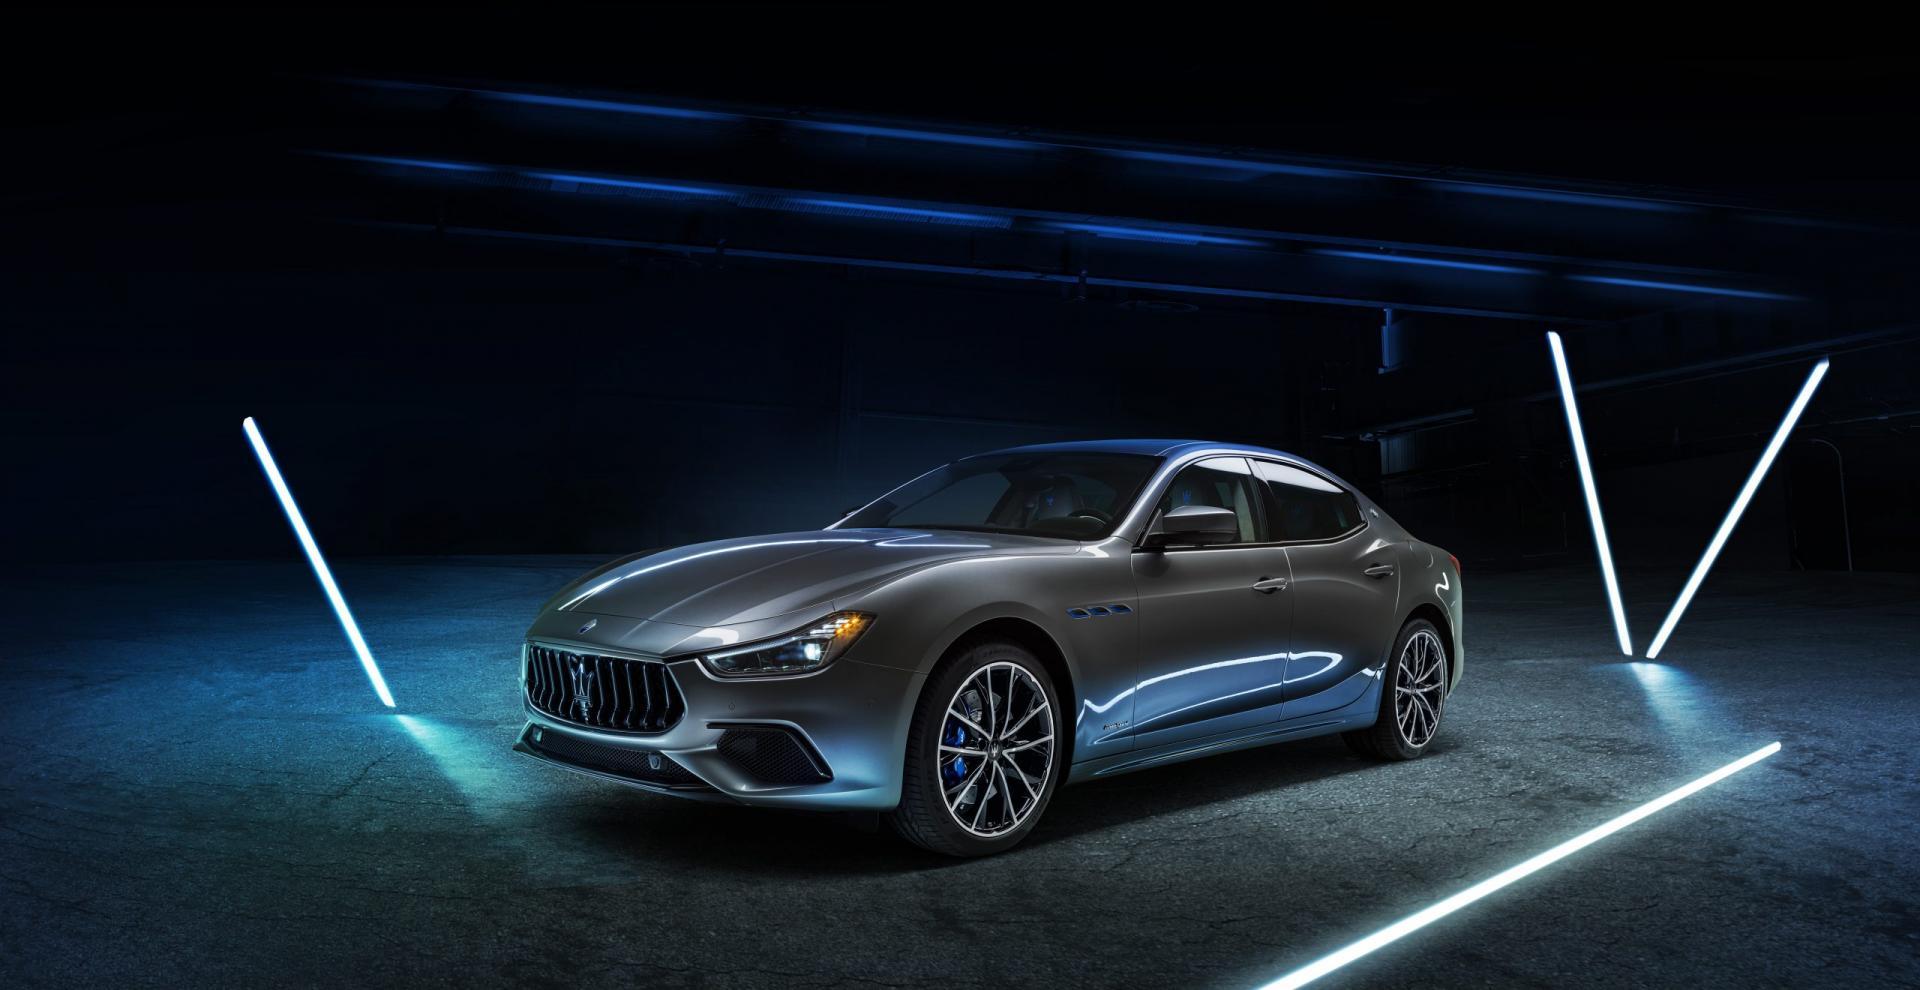 maserati ghibli hybrid, 2021, hybride, elektrische auto